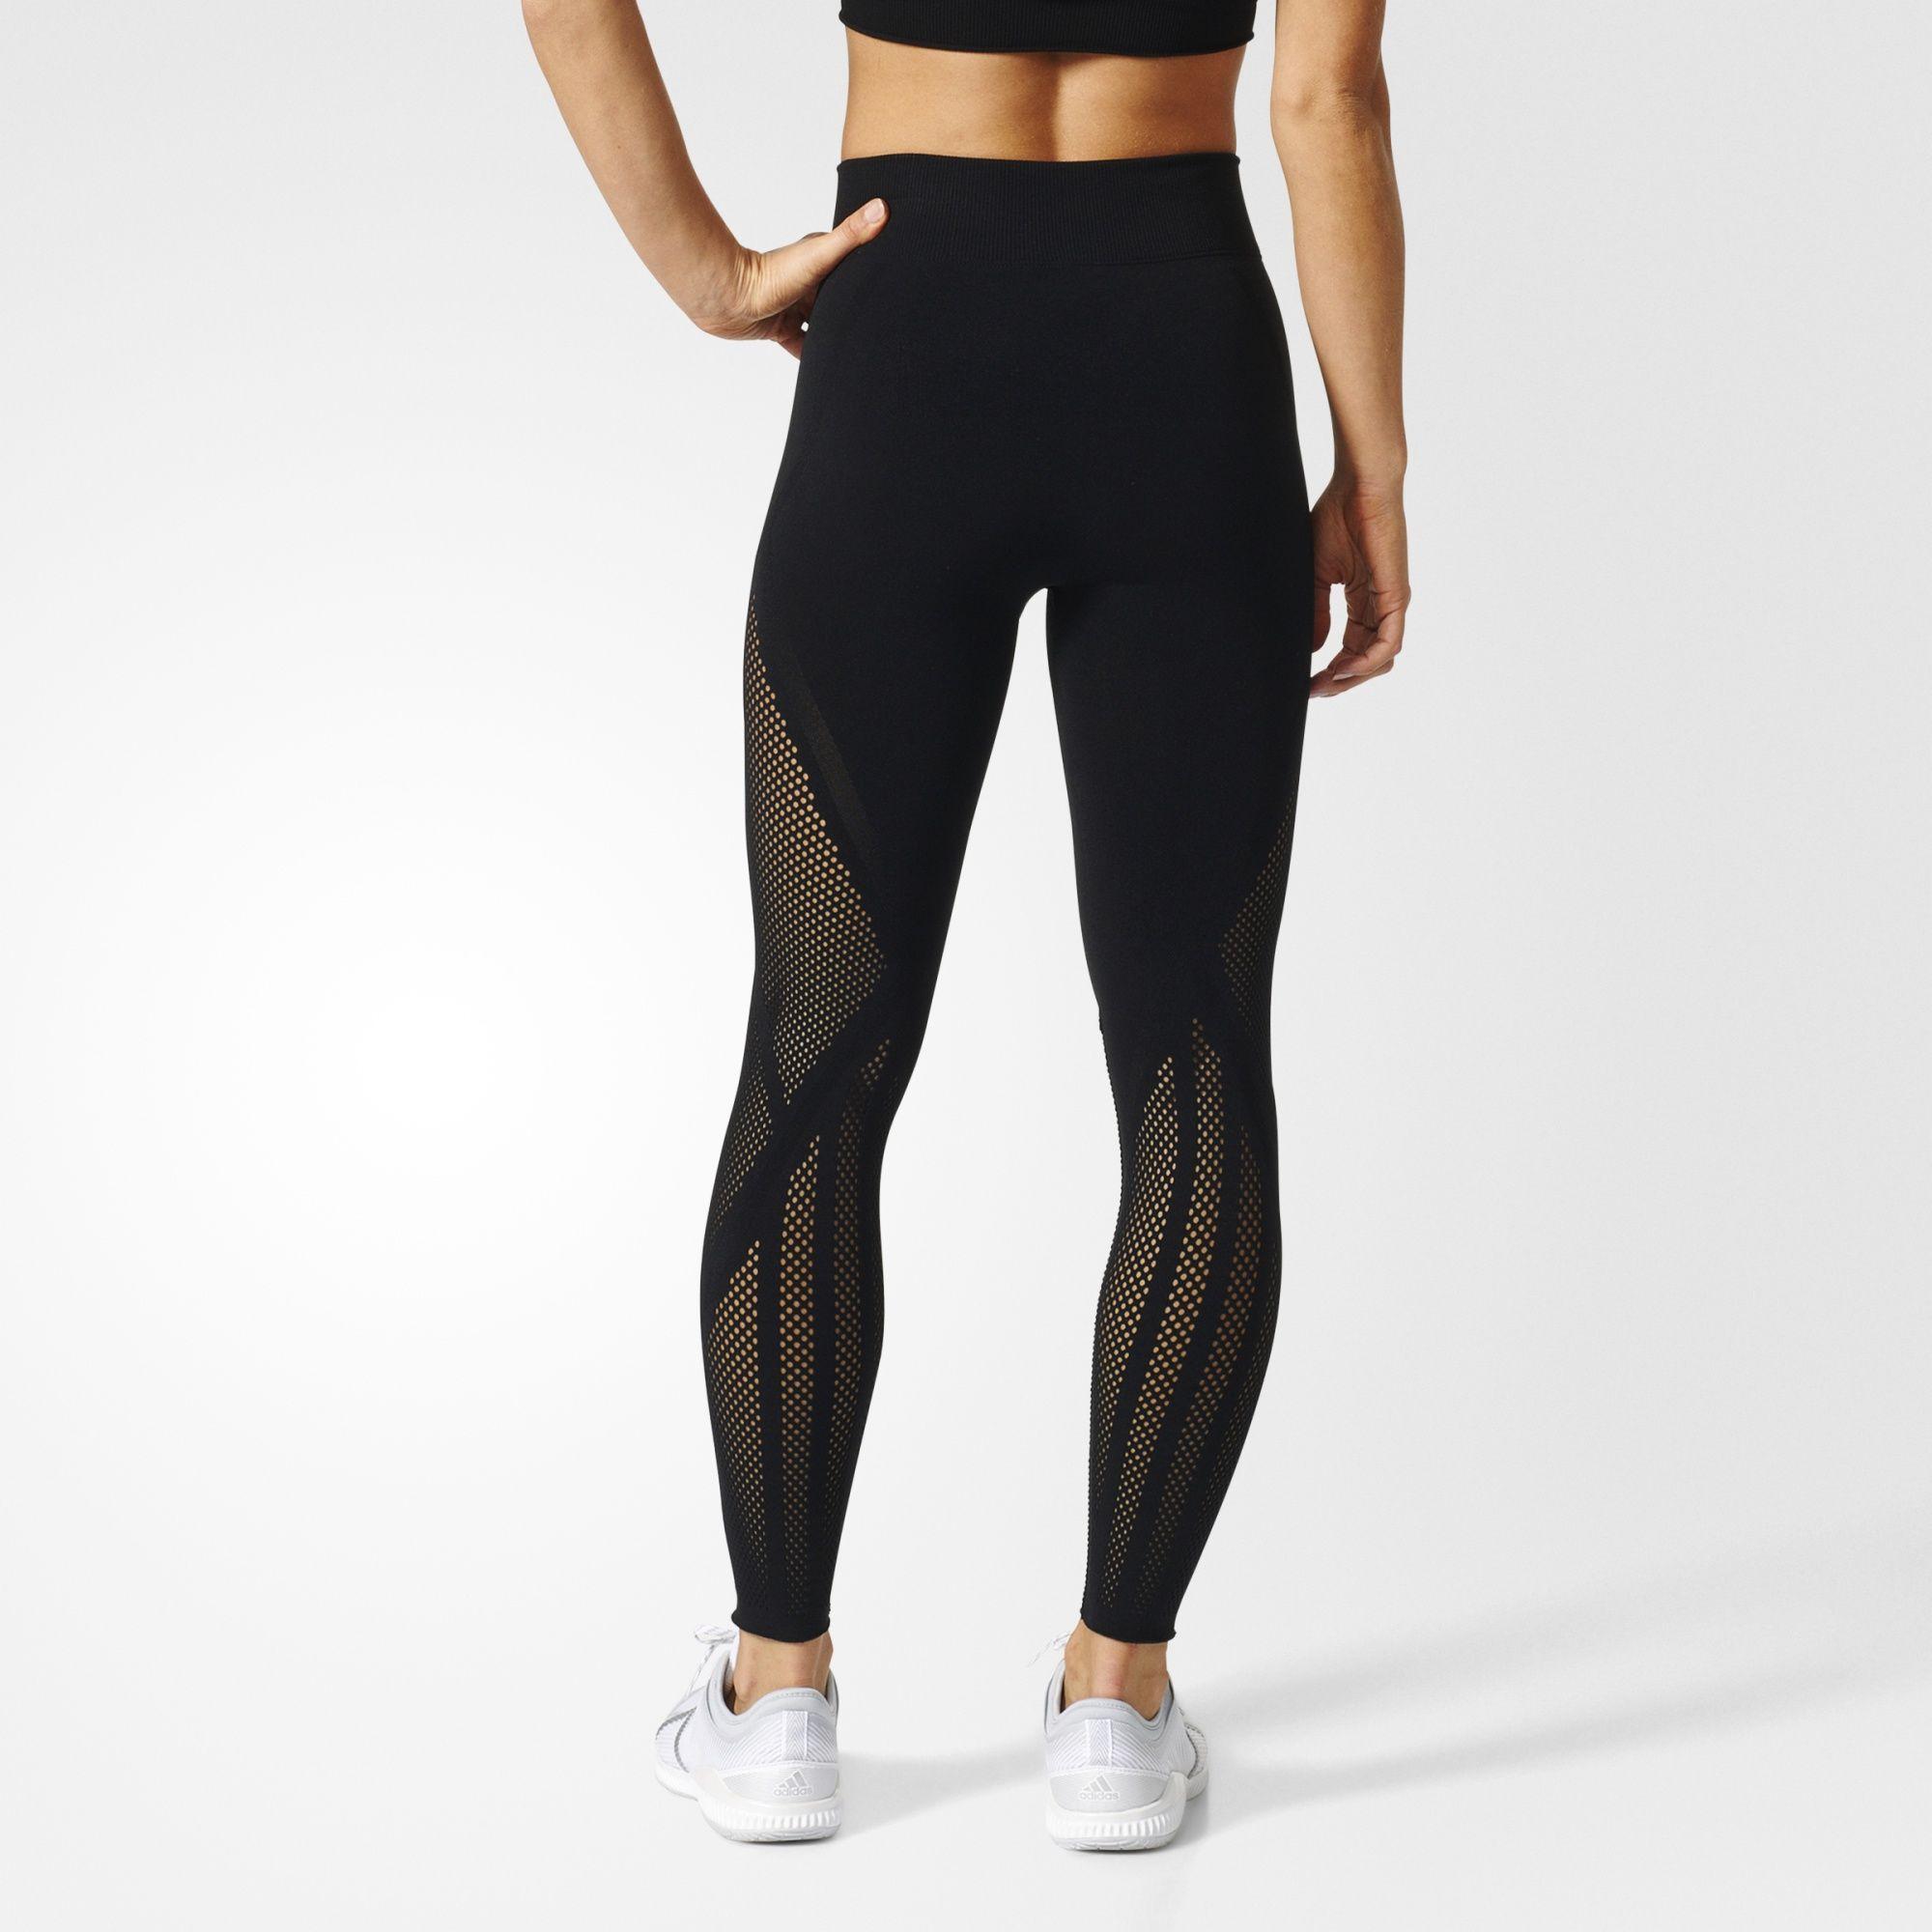 adidas - warp knit Tights - 100 . adidas - warp knit Tights - 100  Pilates  Workout ... 25d8ff626fe